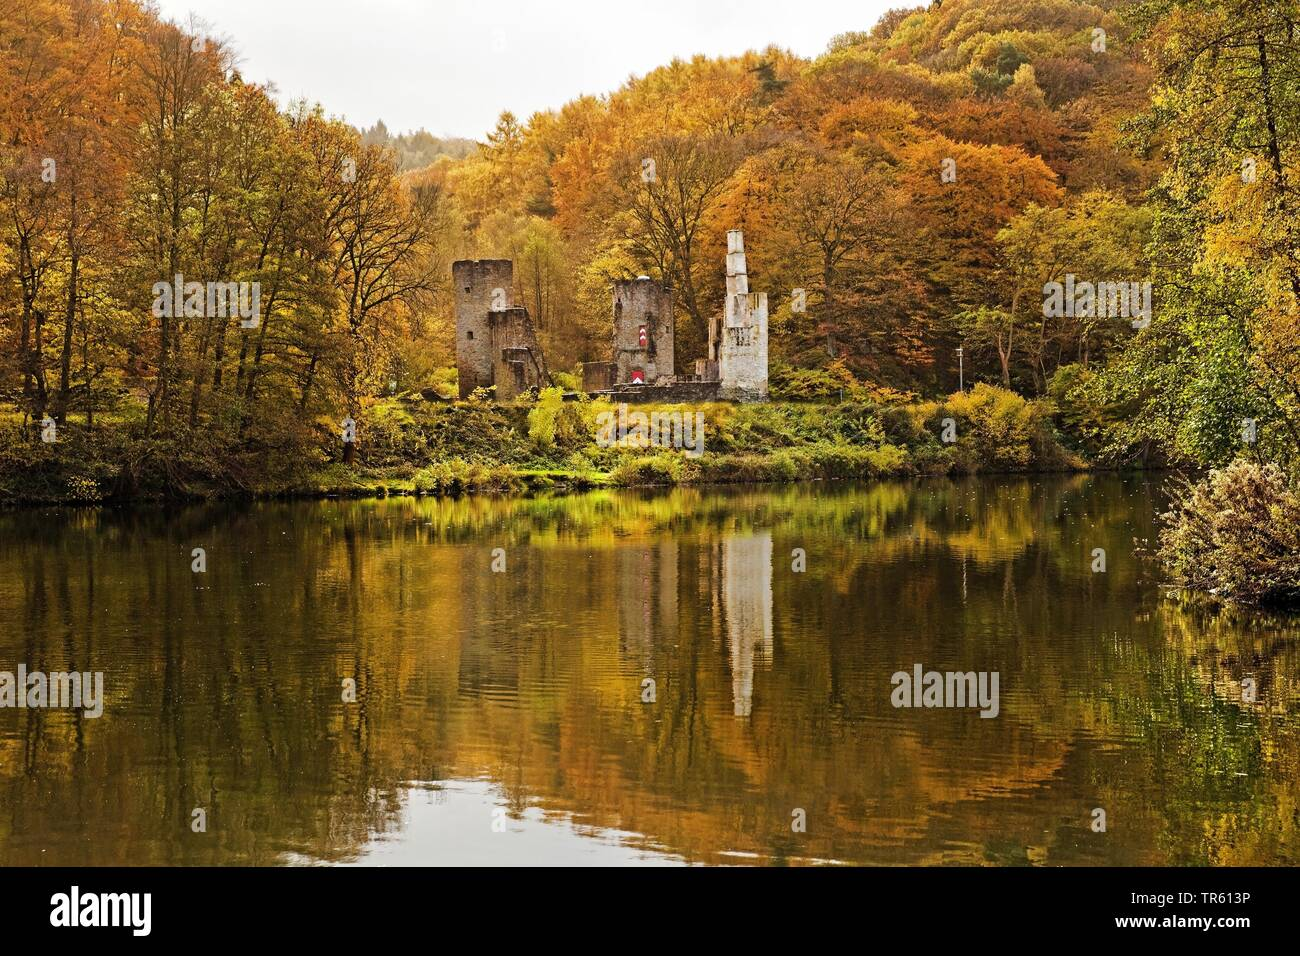 Hardenstein castle ruin on the Ruhr riverbank in autumn, Germany, North Rhine-Westphalia, Ruhr Area, Witten Stock Photo